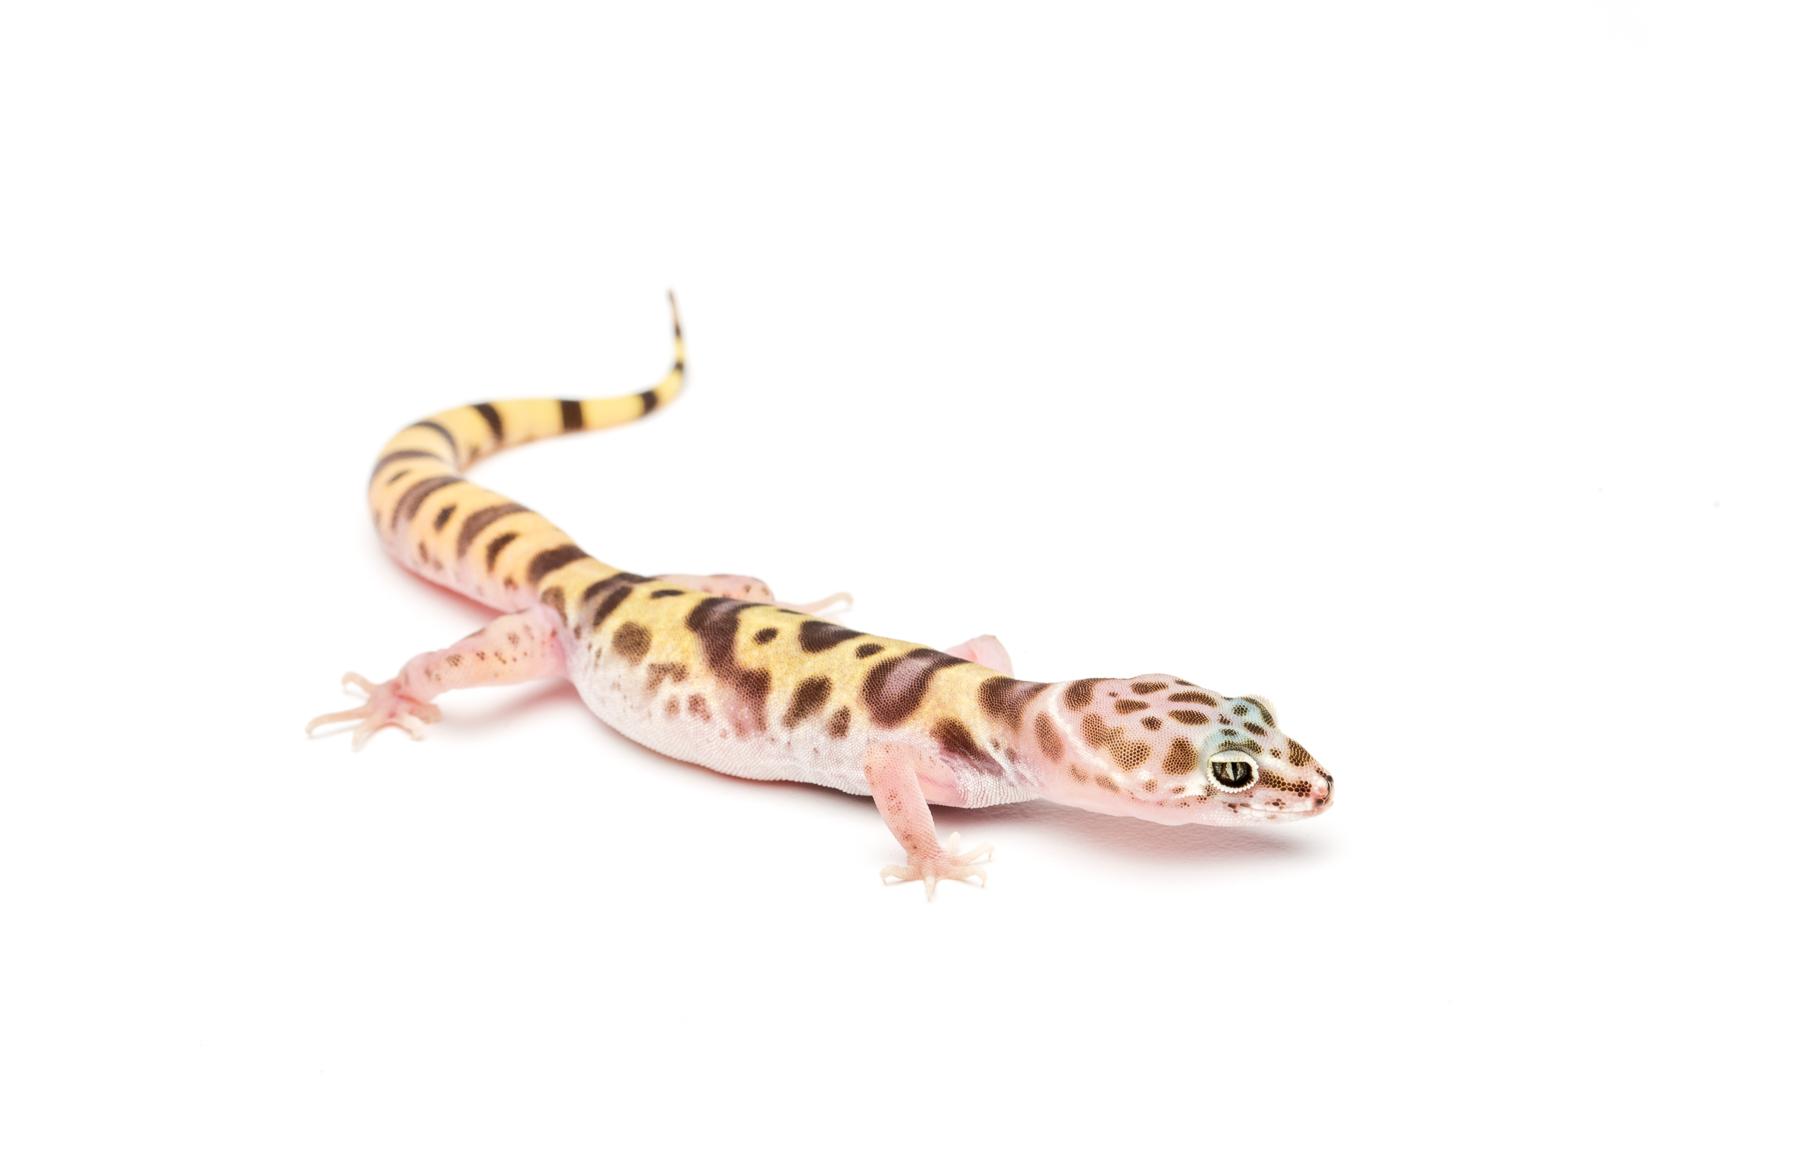 Female Tucson banded gecko (Coleonyx variegatus bogerti)